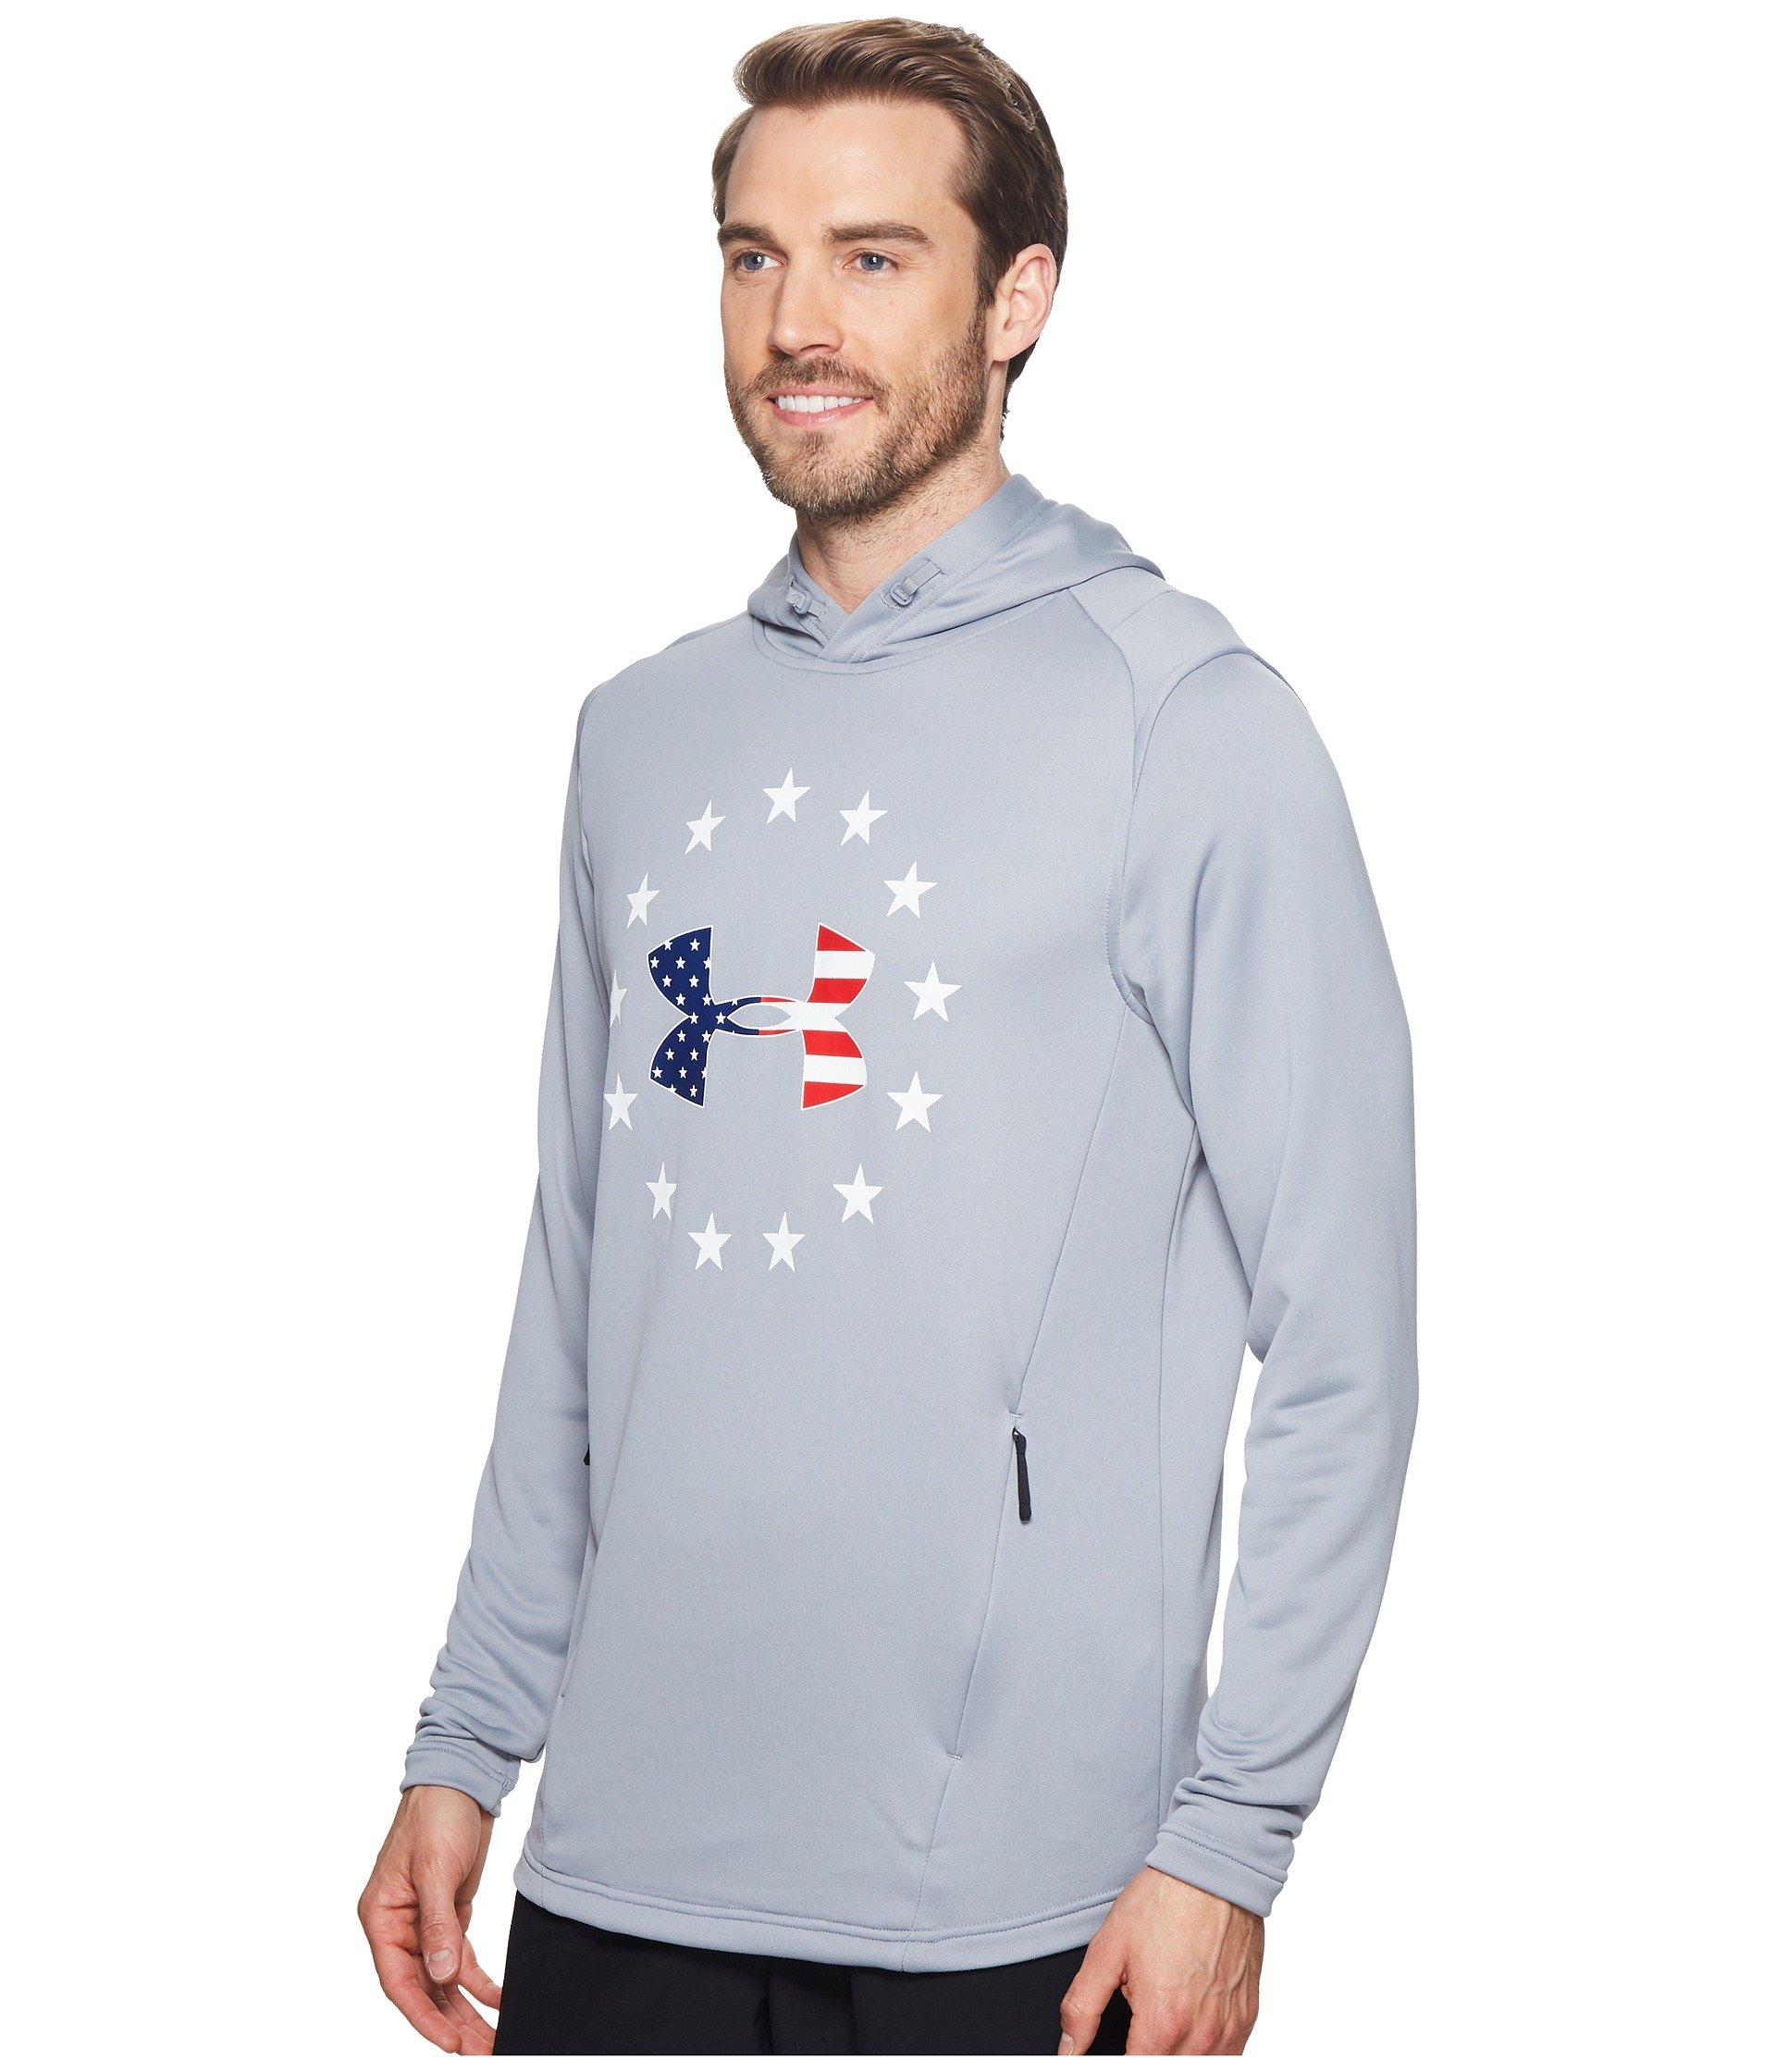 Under Armour Boys Terry Freedom Hoodie 1323171 UA Kids Sweatshirt Grey Youth New